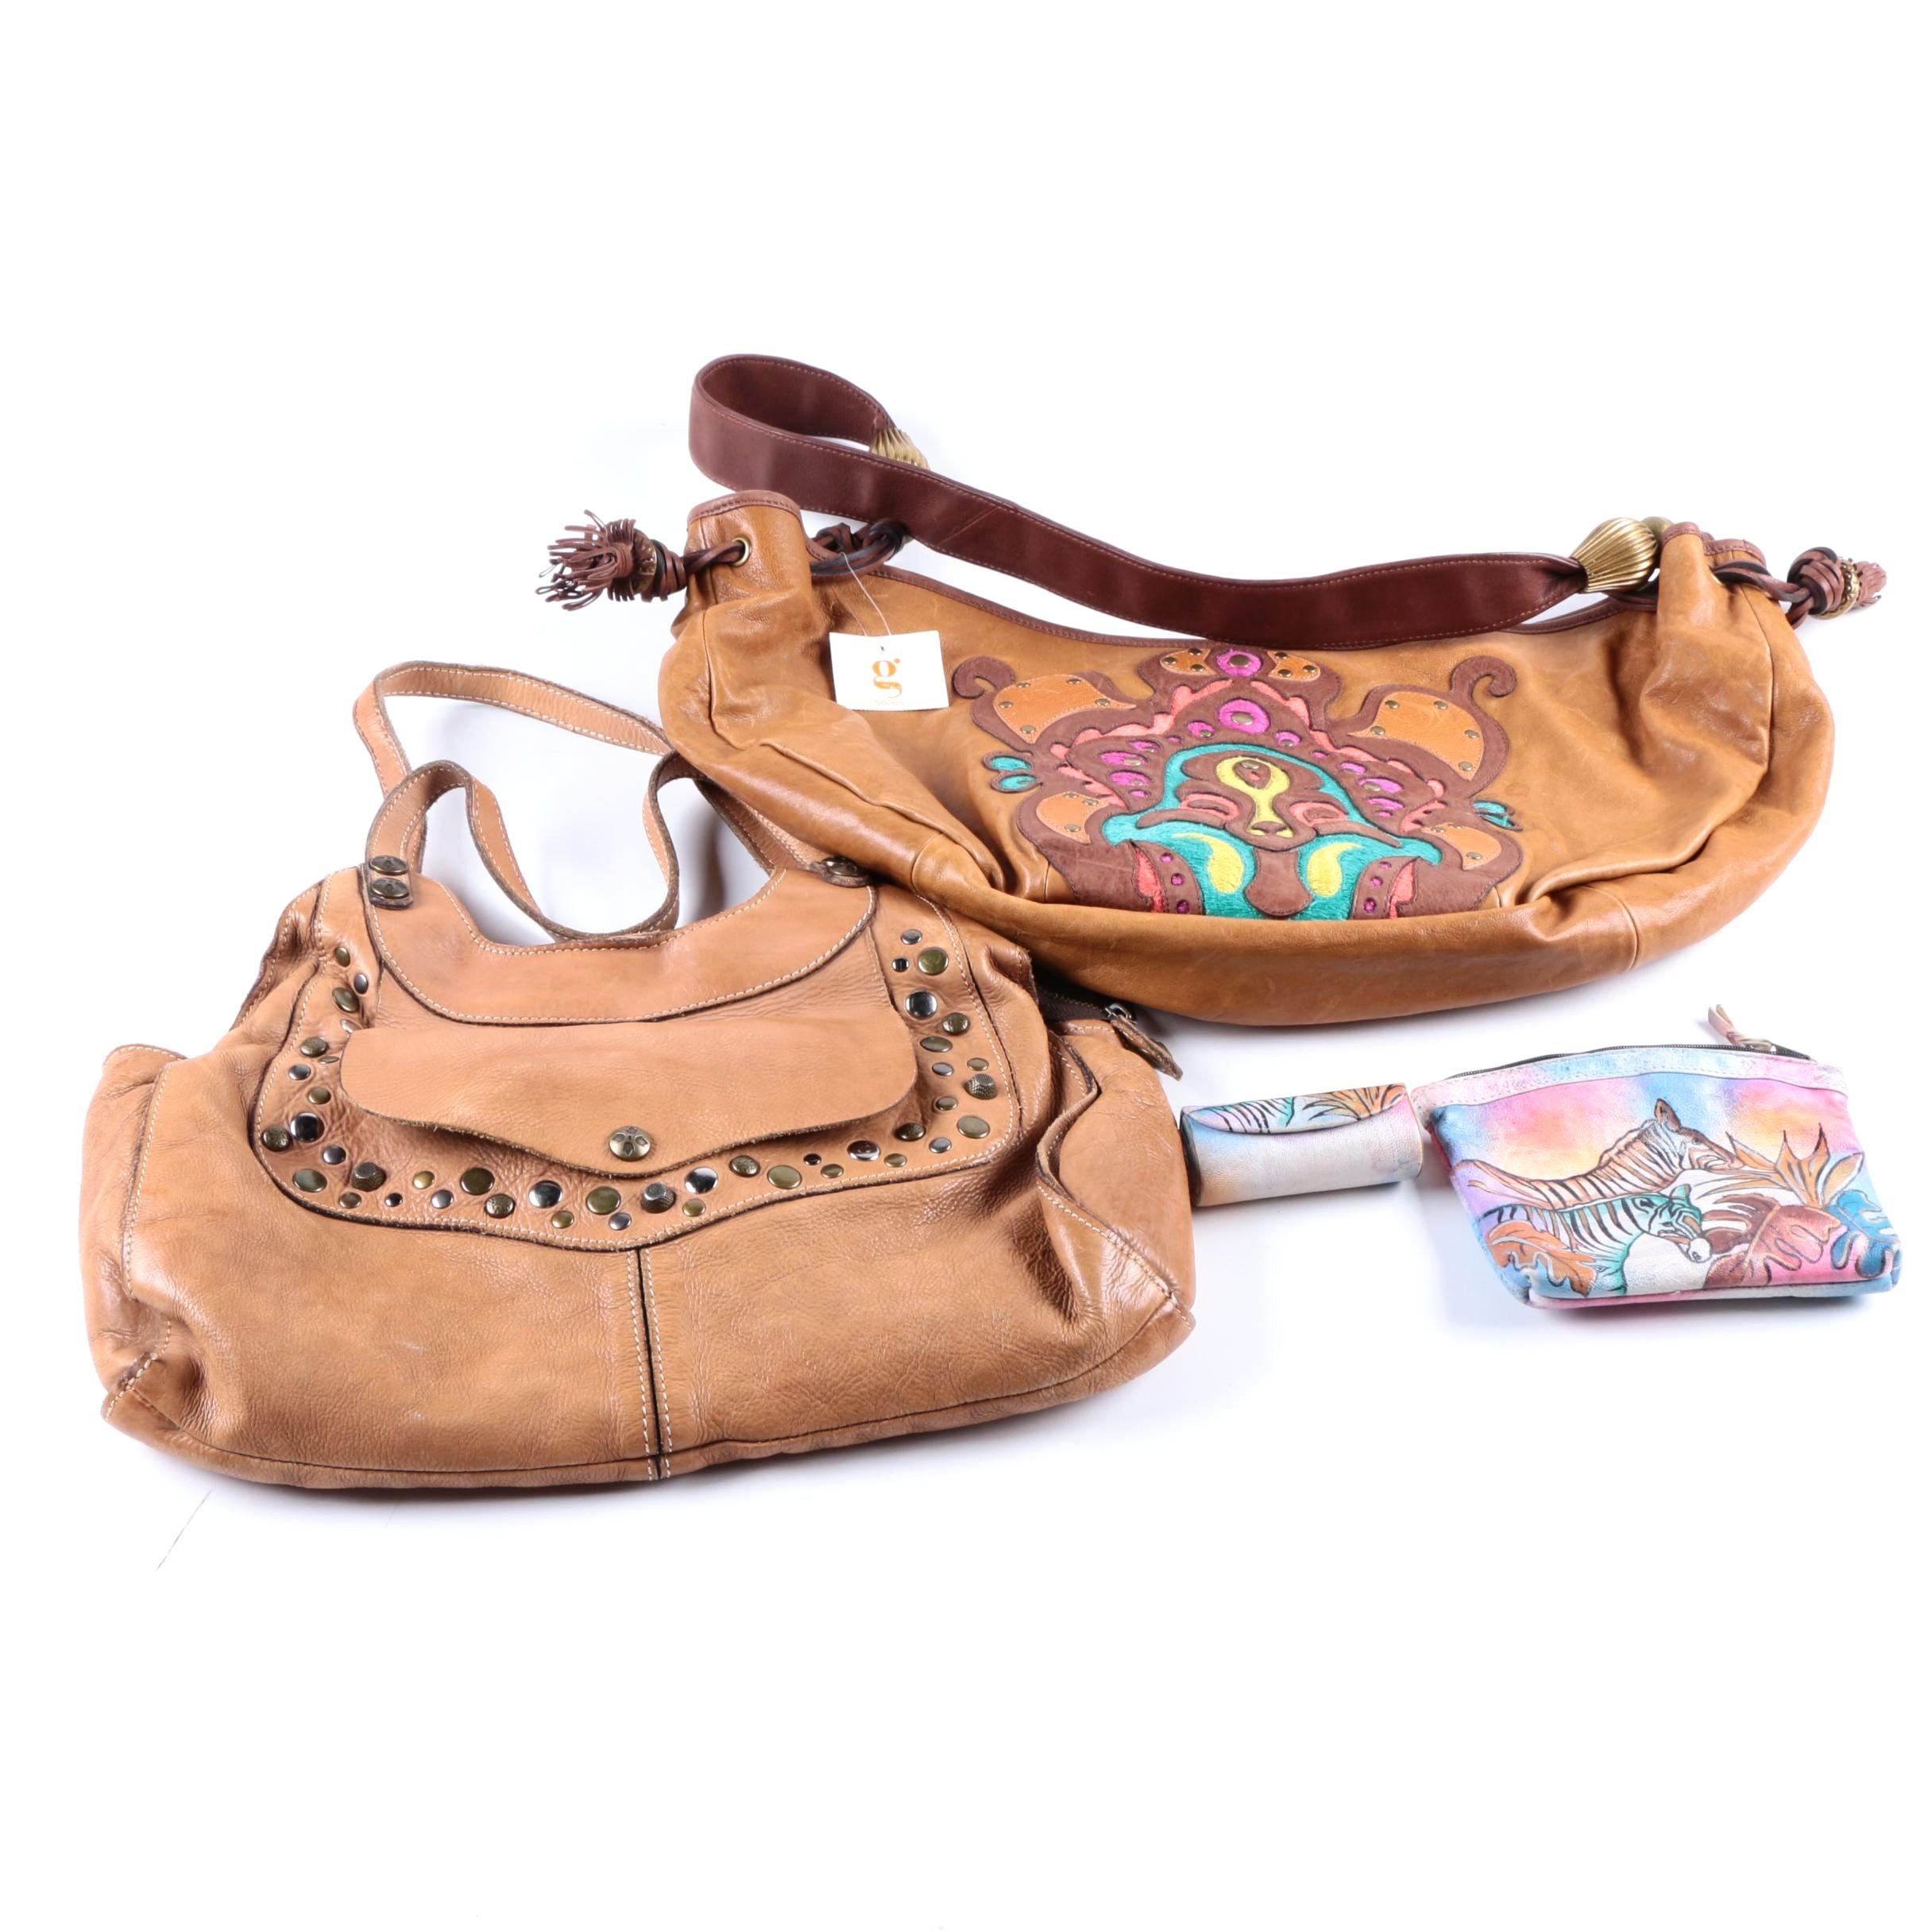 Collection of Three Women's Handbags